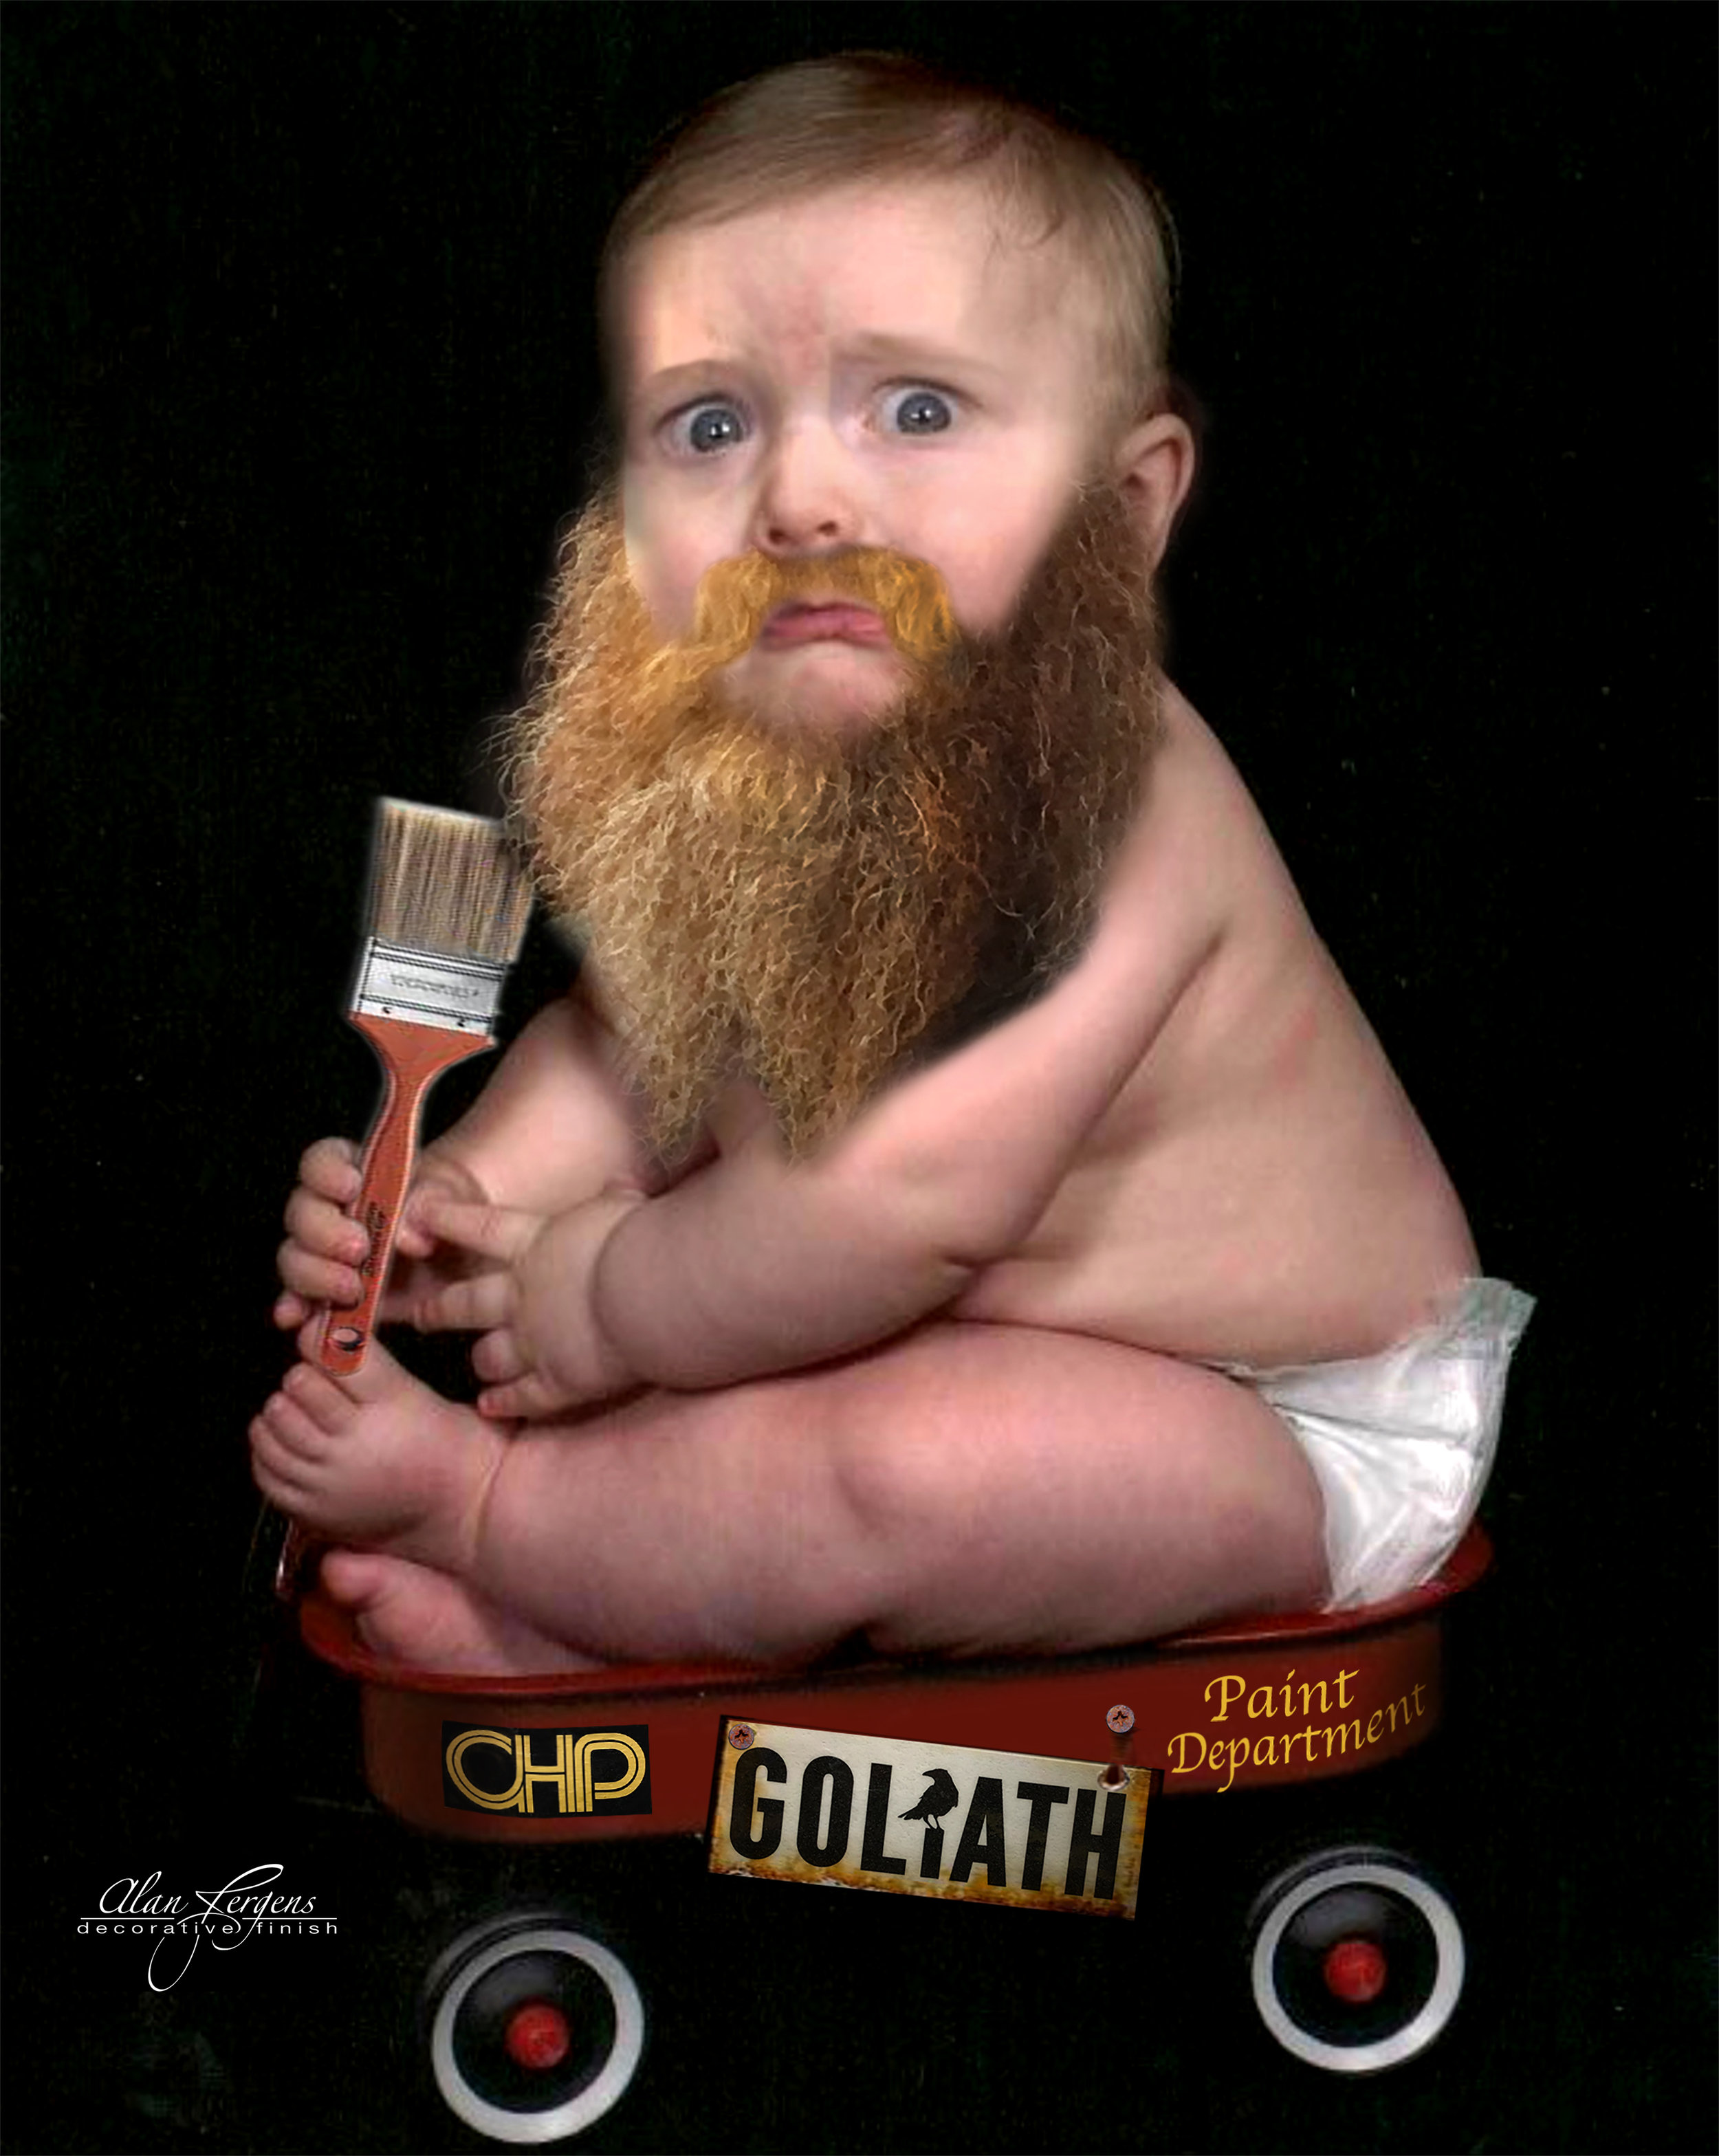 baby chuck.jpg